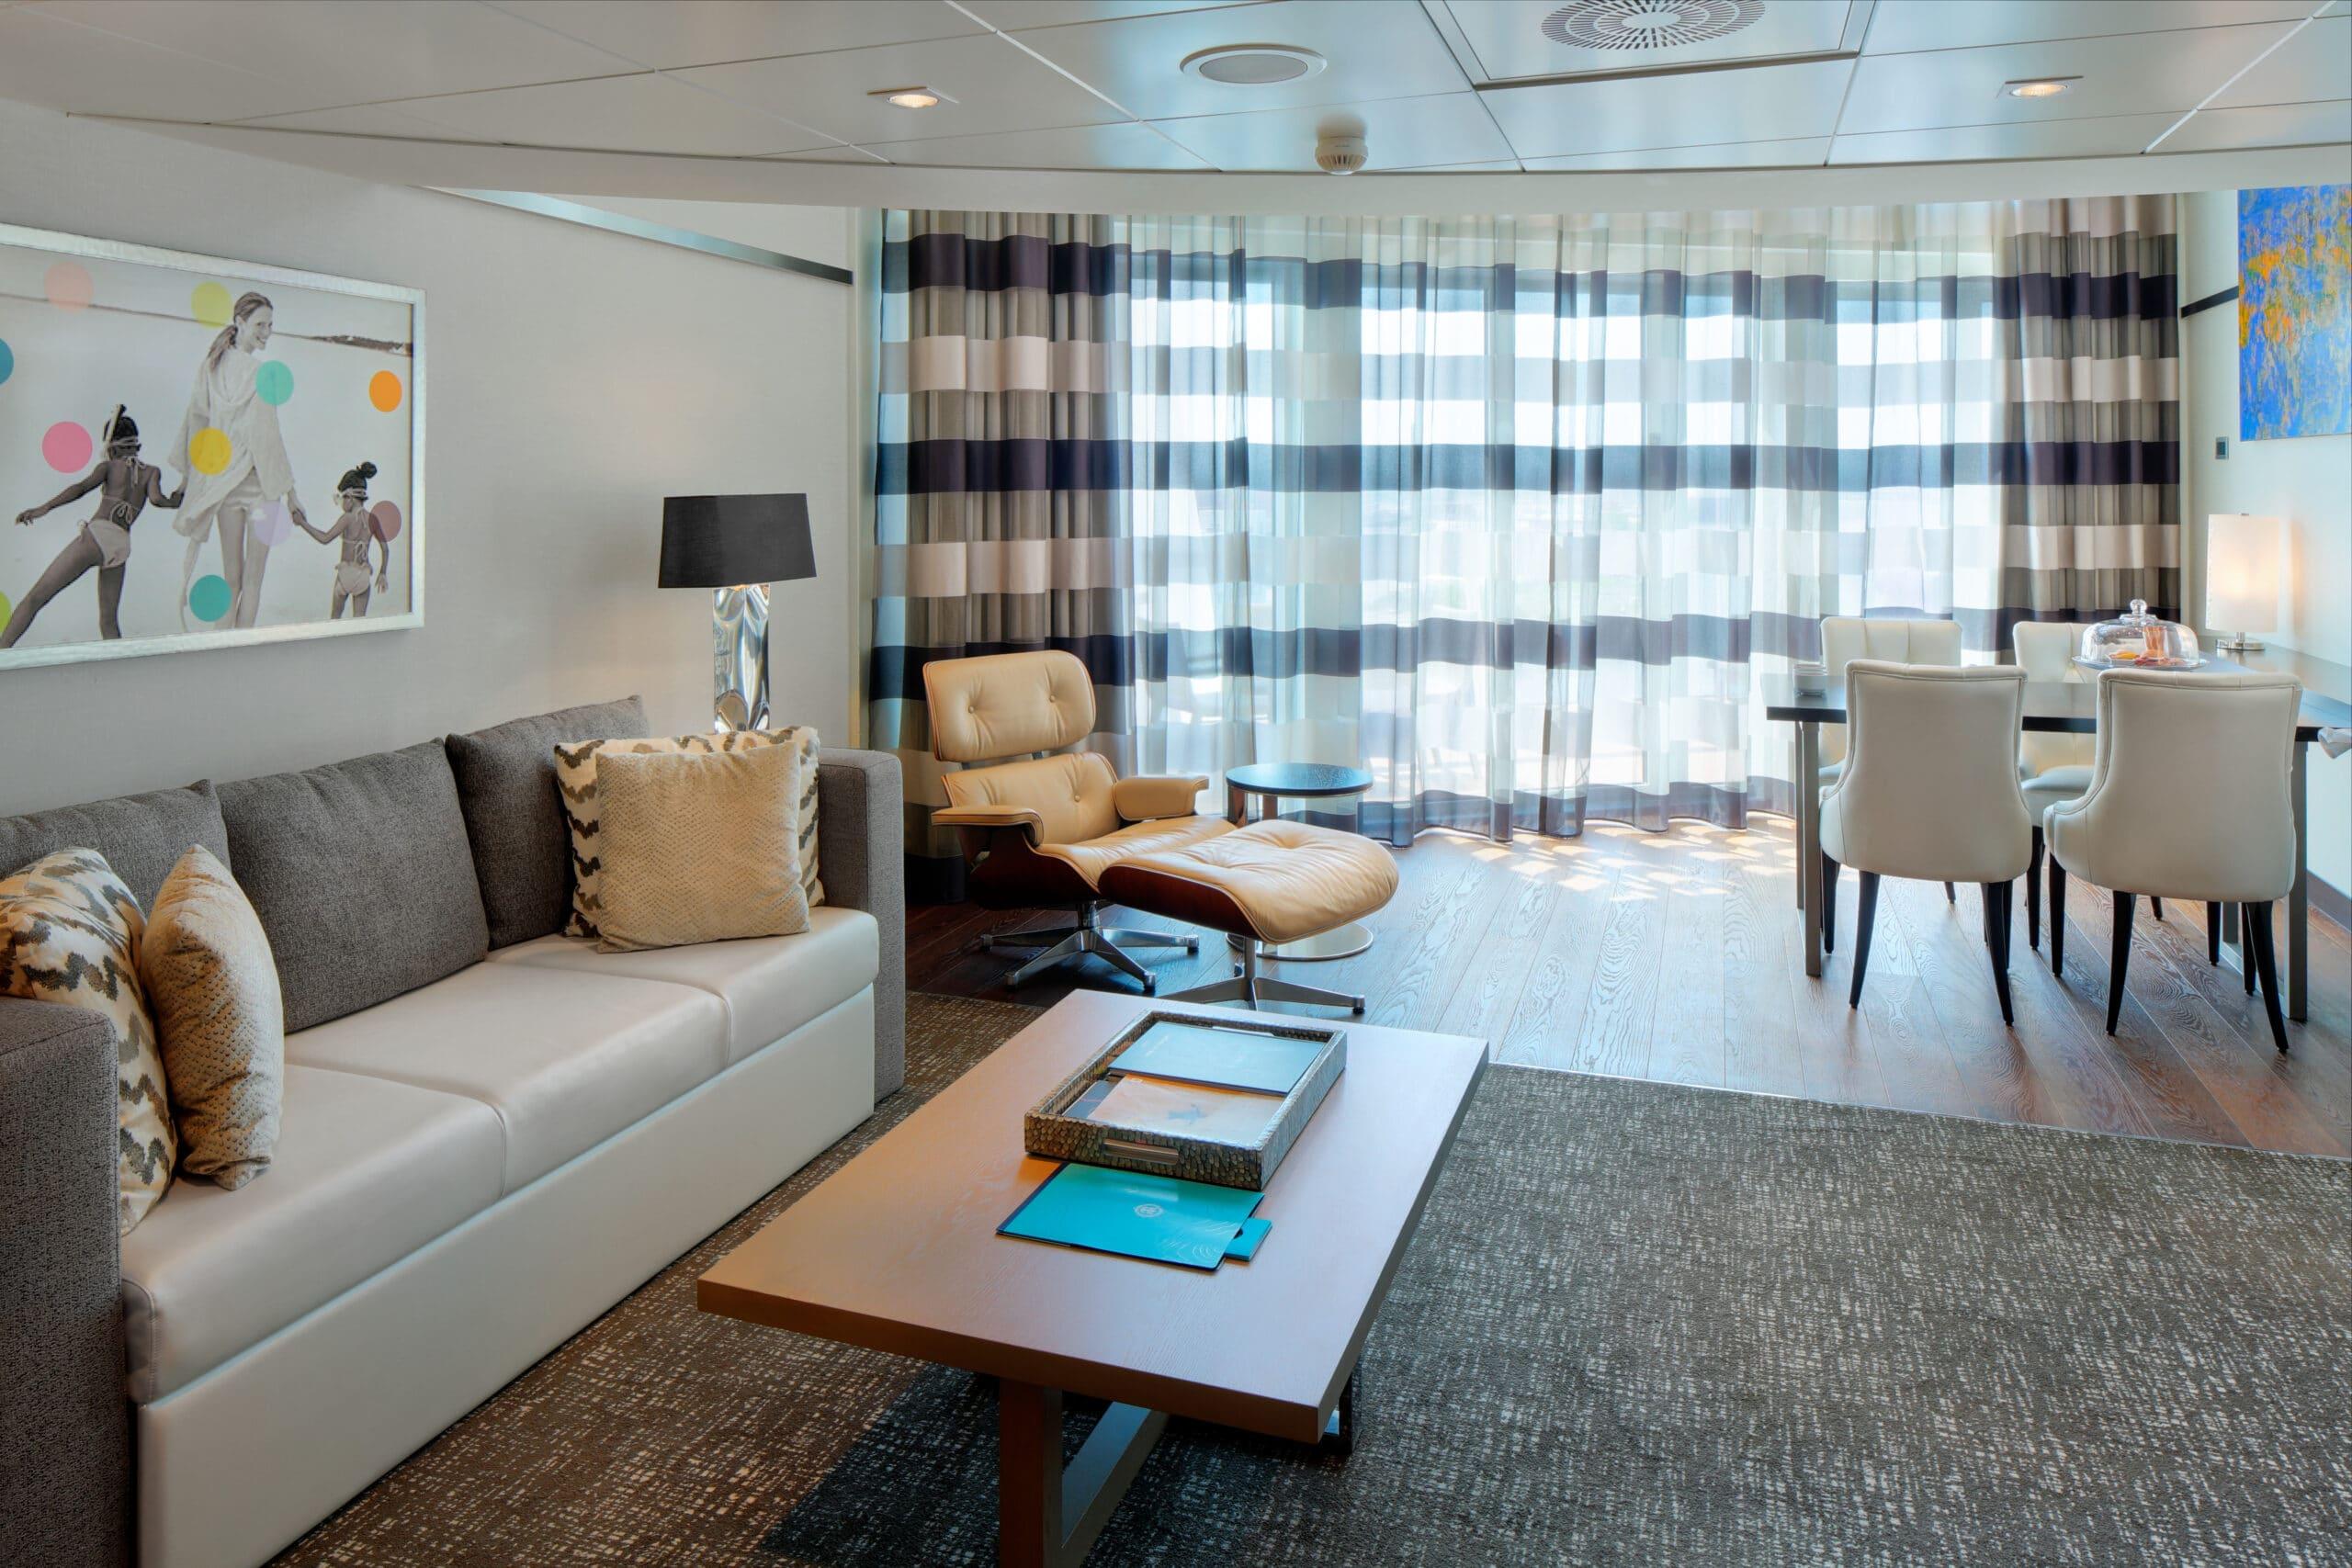 Royal-Caribbean-International-Anthem-Quantum-Ovation-Oddysey-of-the-seas-schip-cruiseschip-categorie-OL-Owner-Loft-Suite